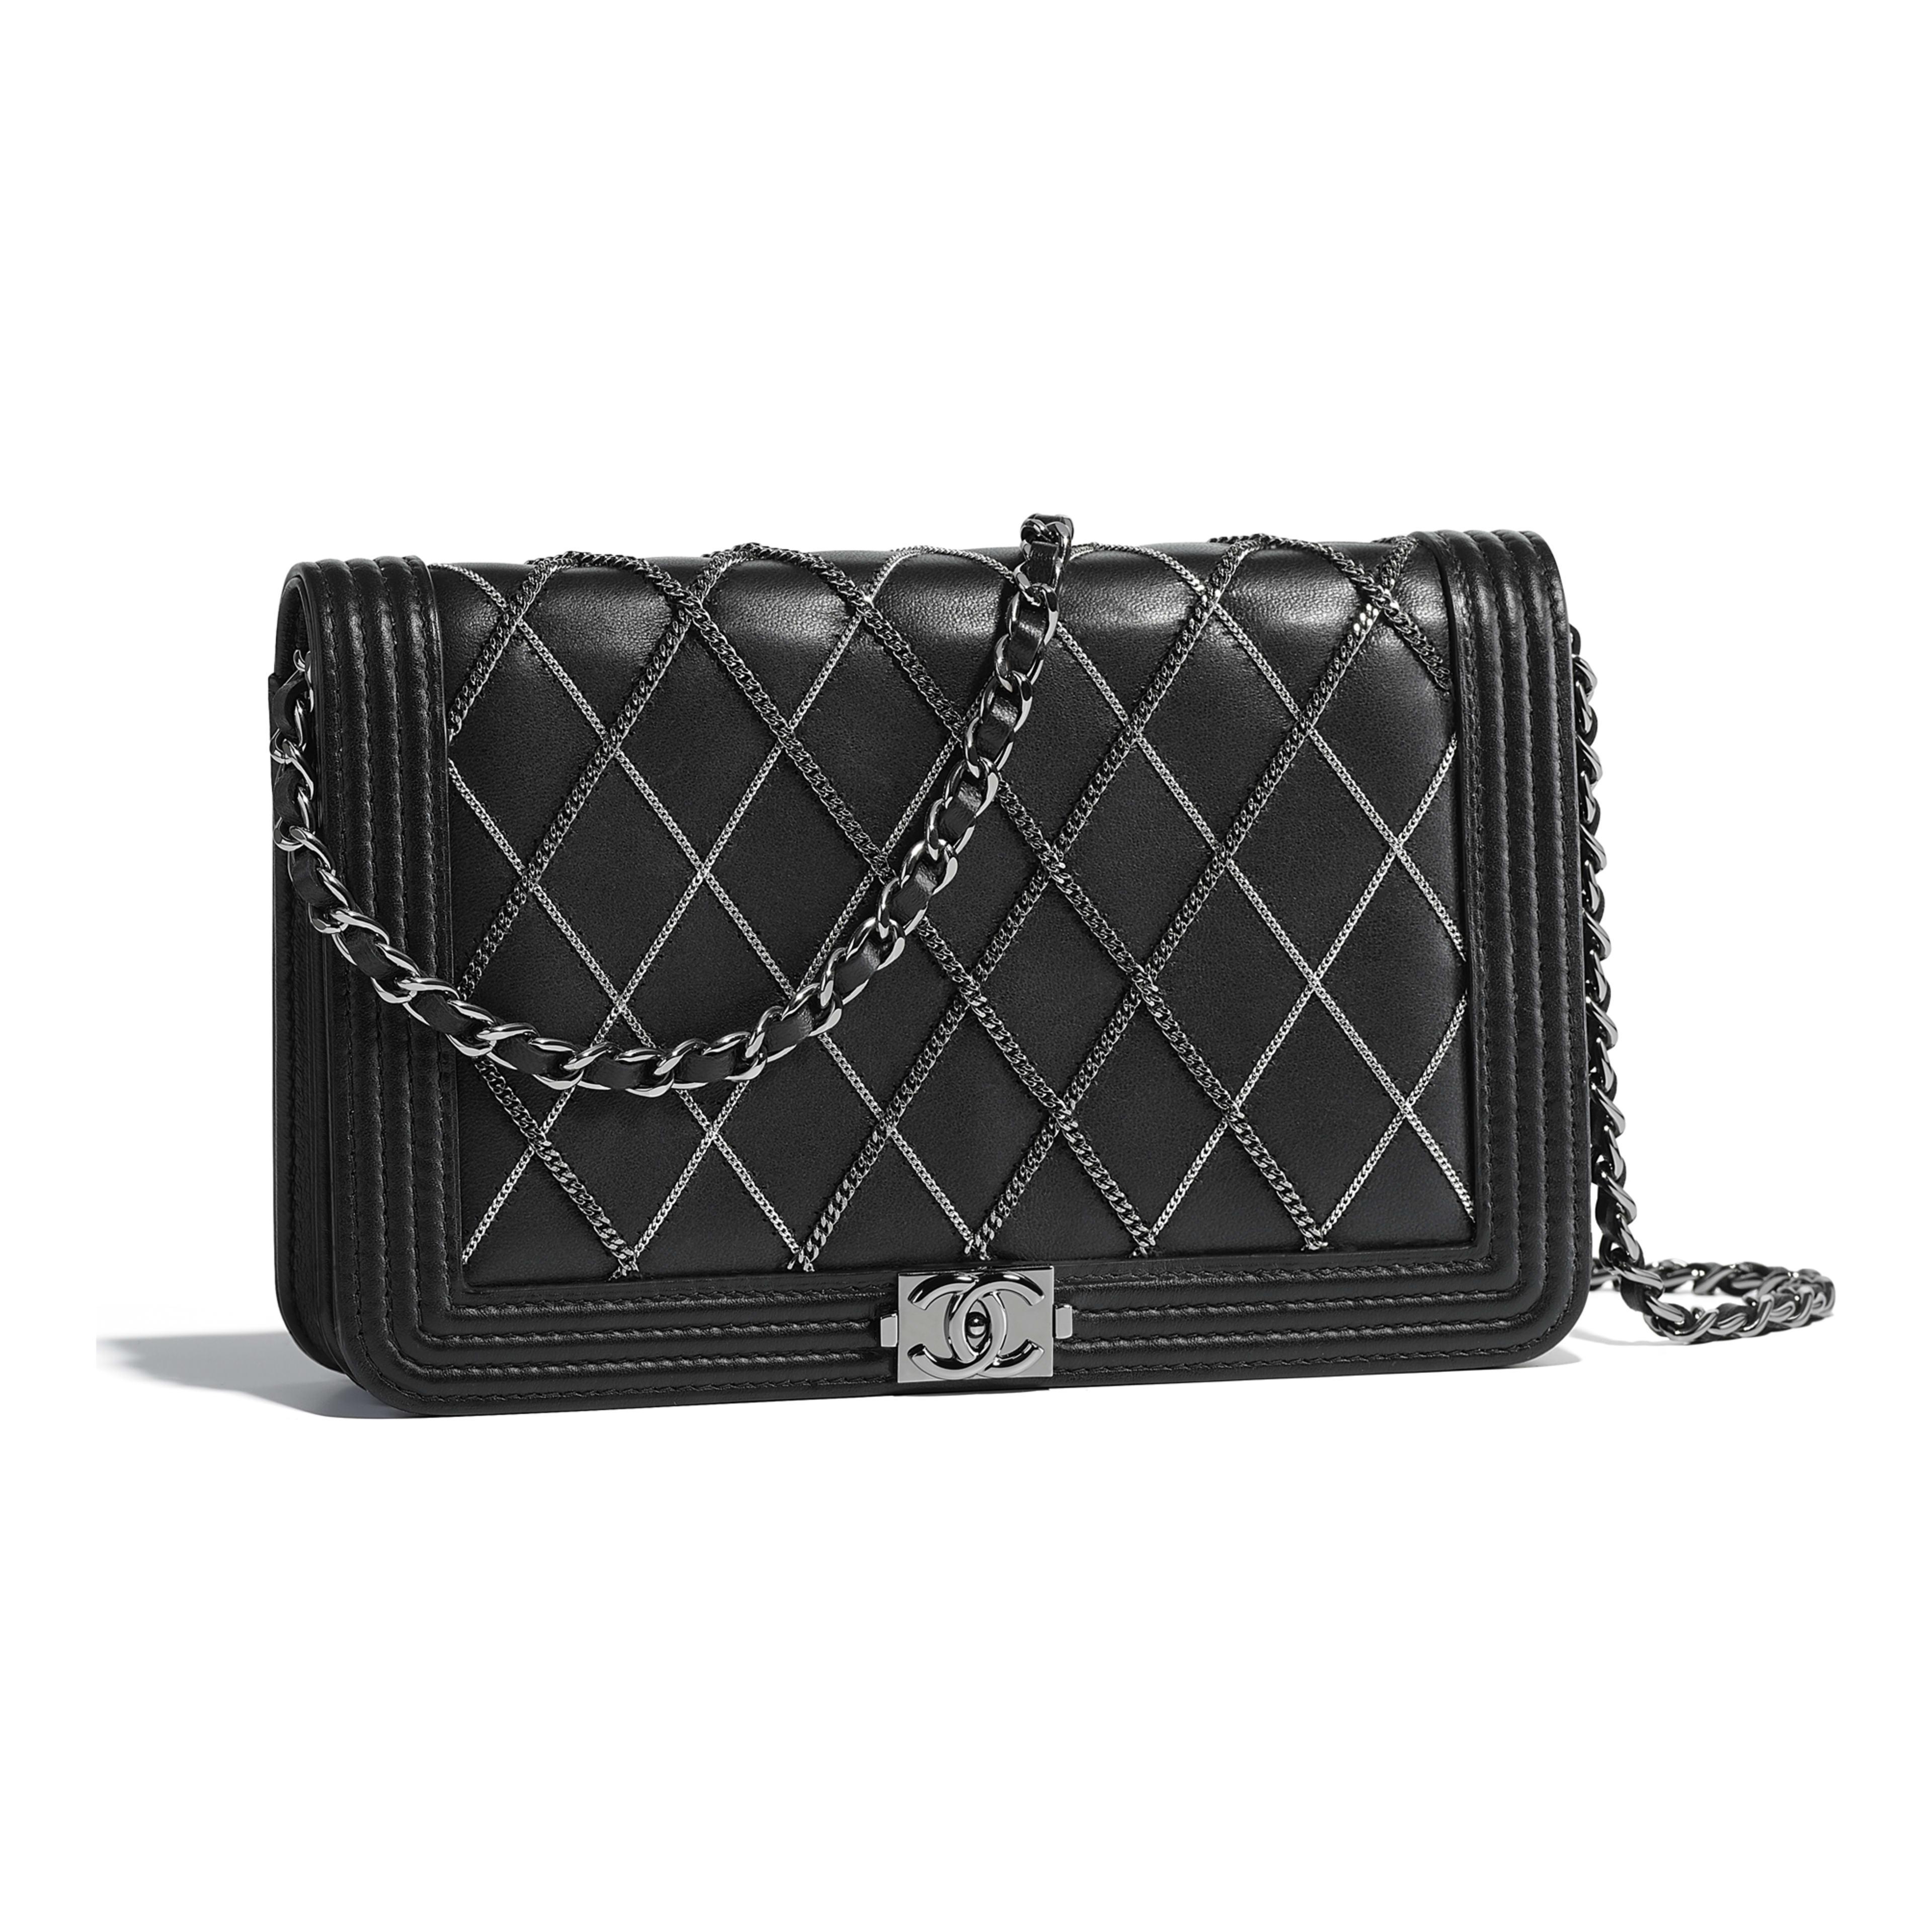 Boy Chanel Wallet On Chain